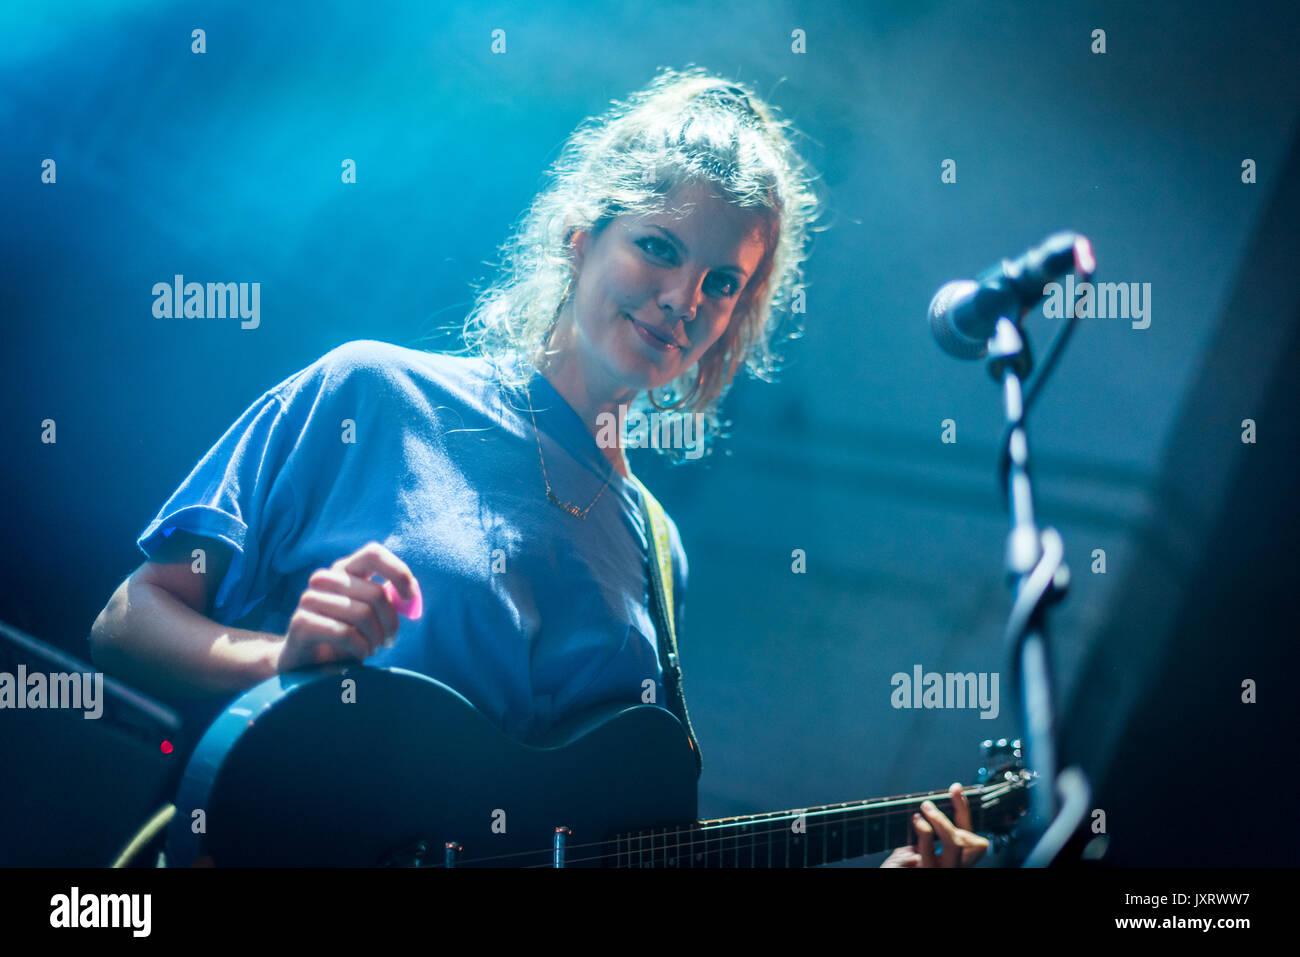 Edinburgh, Scotland, UK. 16th Aug, 2017. Carlotta Cosials of the Madrid band Hinds onstage at Summerhall, Edinburgh, Stock Photo